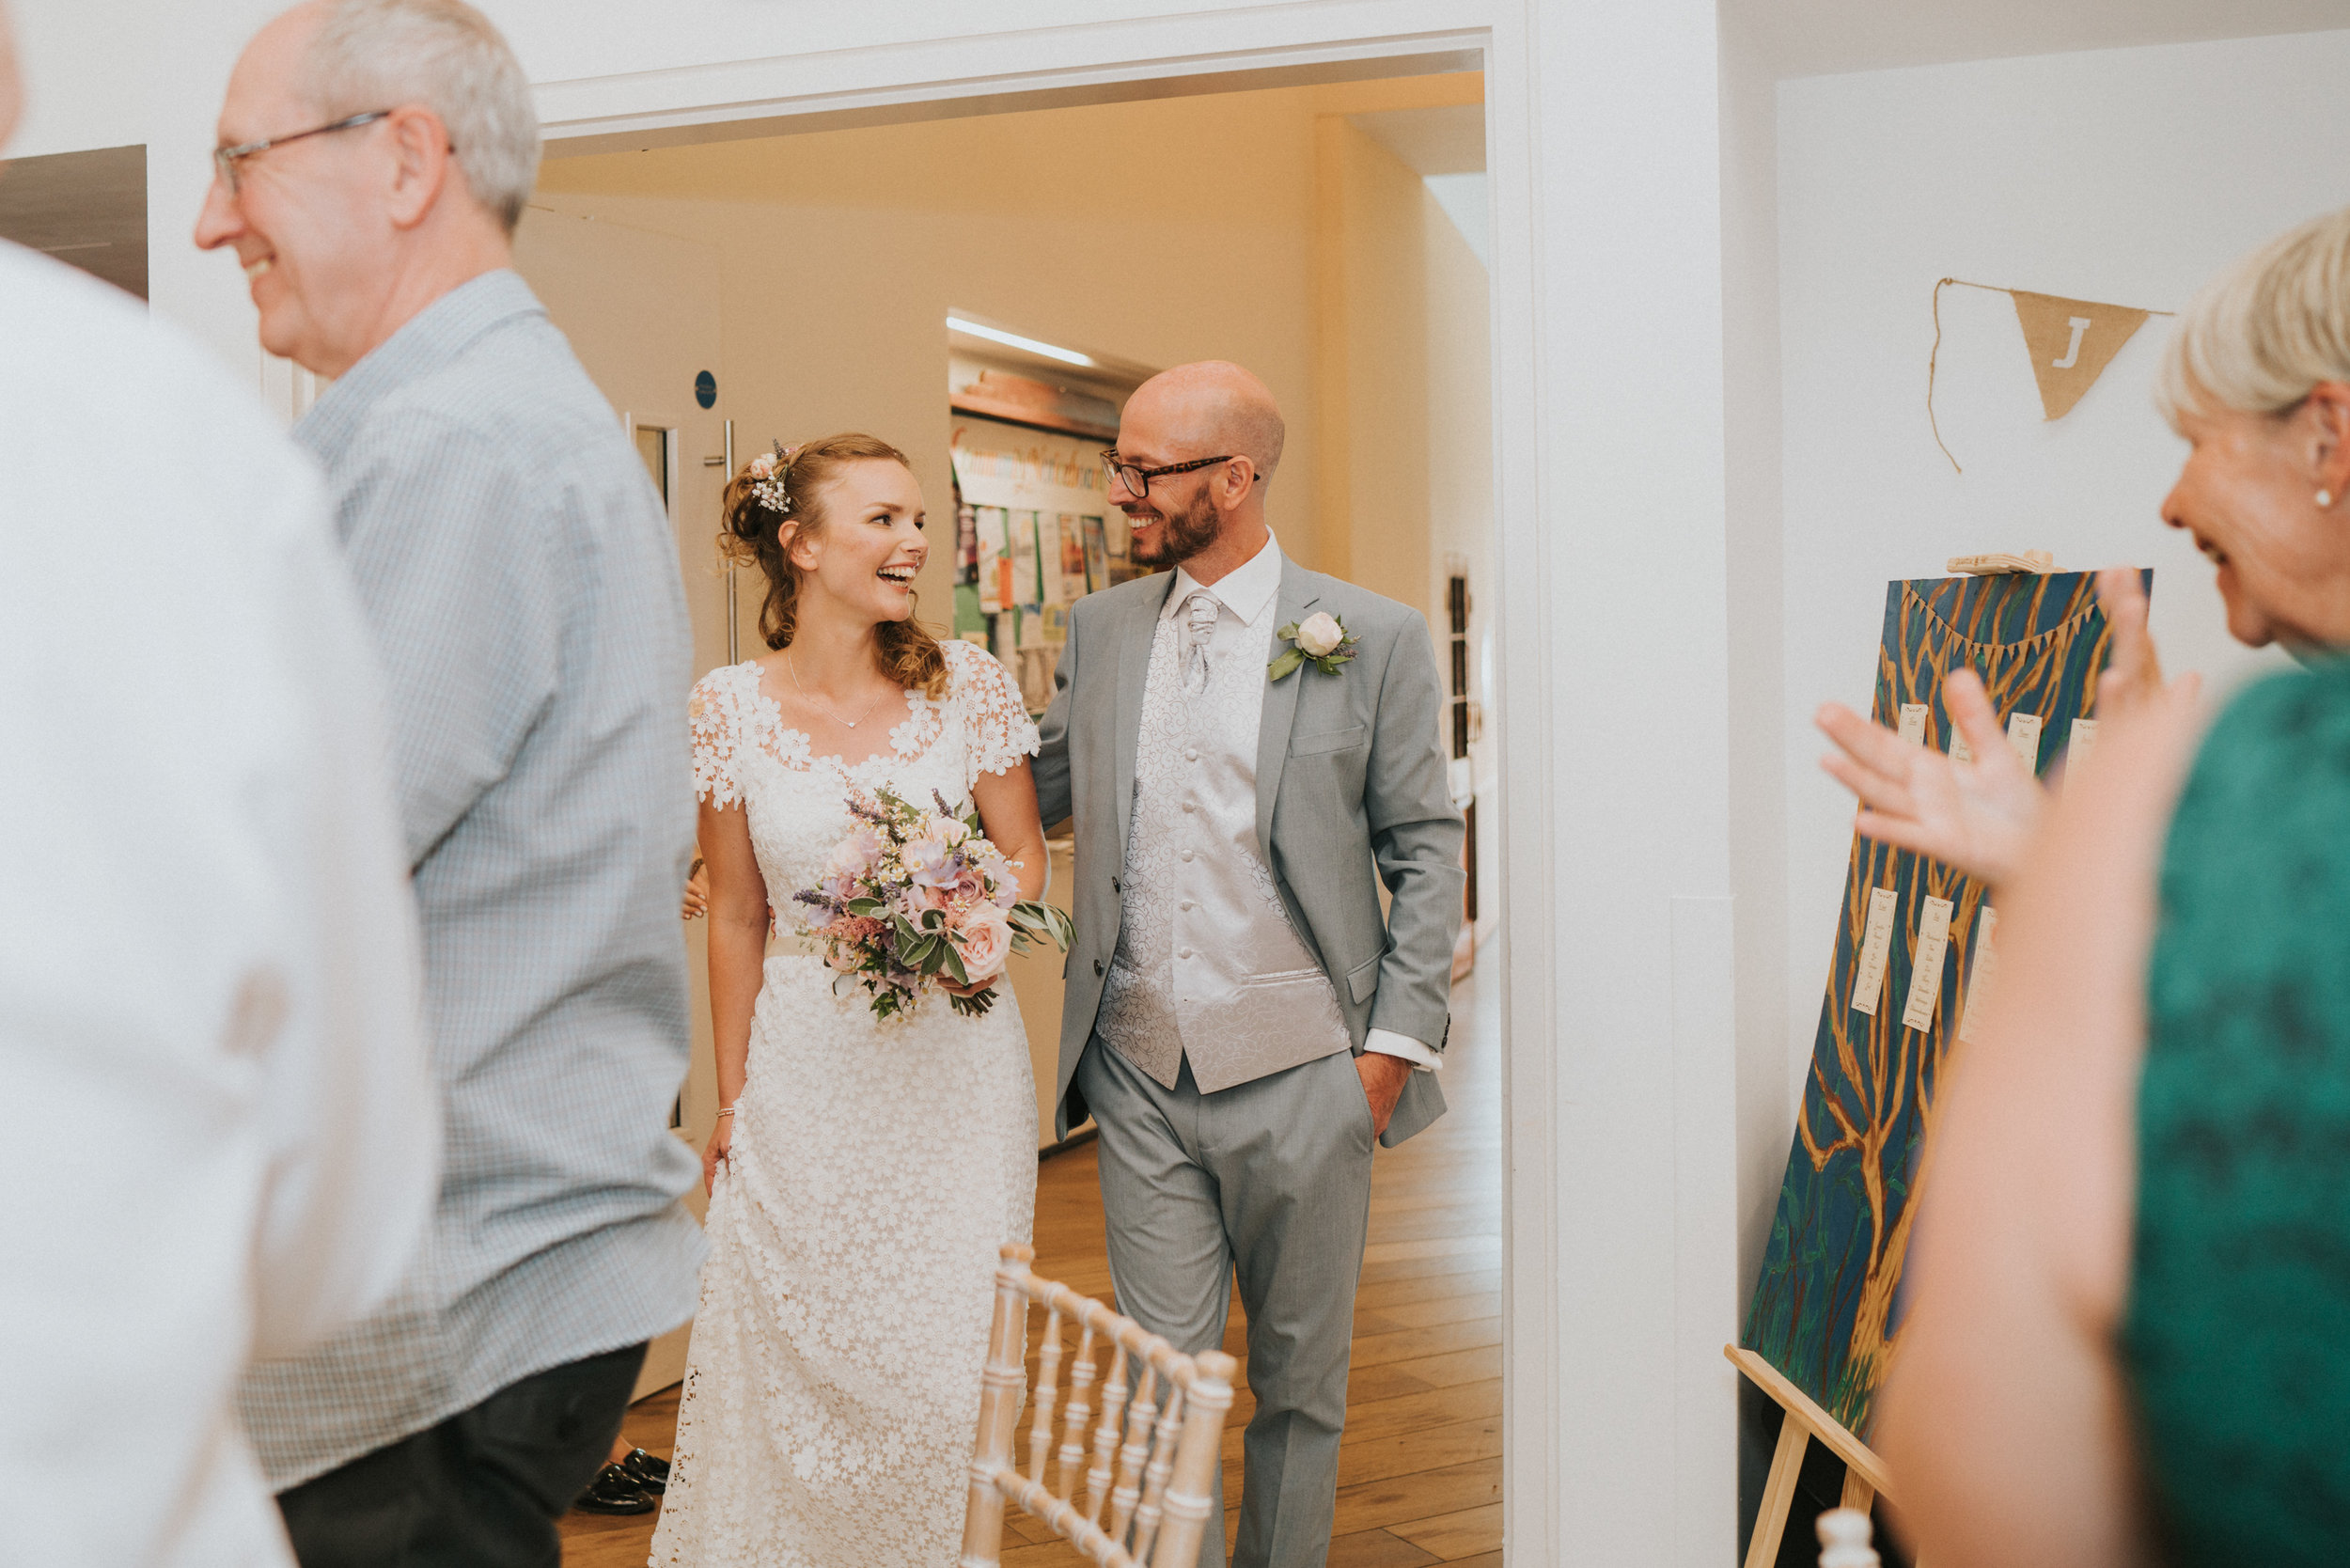 Grace-Elizabeth-Georgie-Amalaketu-Firstsite-Colchester-Essex-Boho-Buddhist-Wedding-Alternative-Wedding-Photography-Essex (100 of 100).jpg